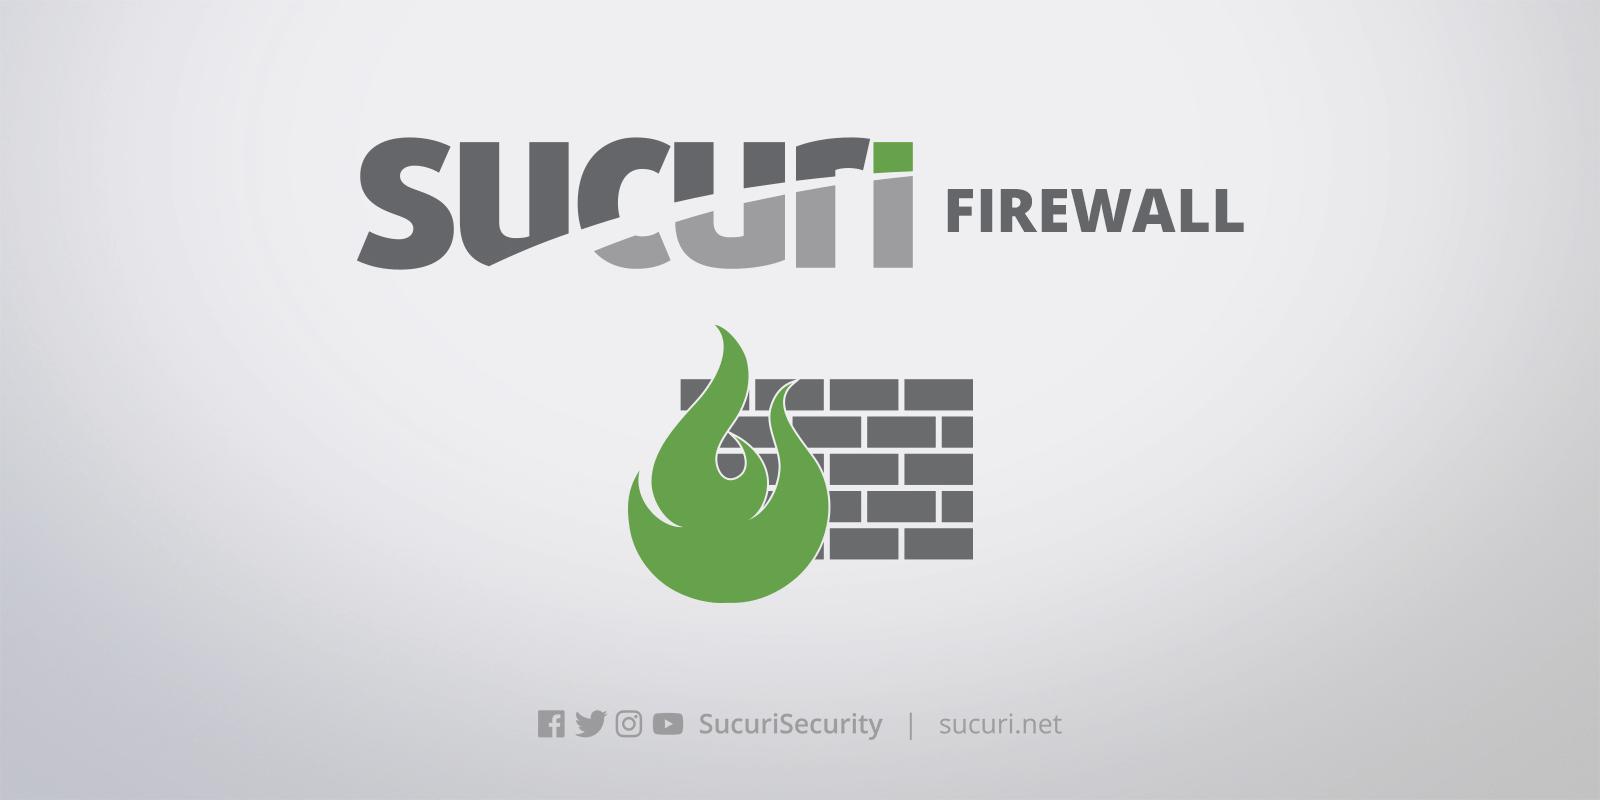 Security Web Based